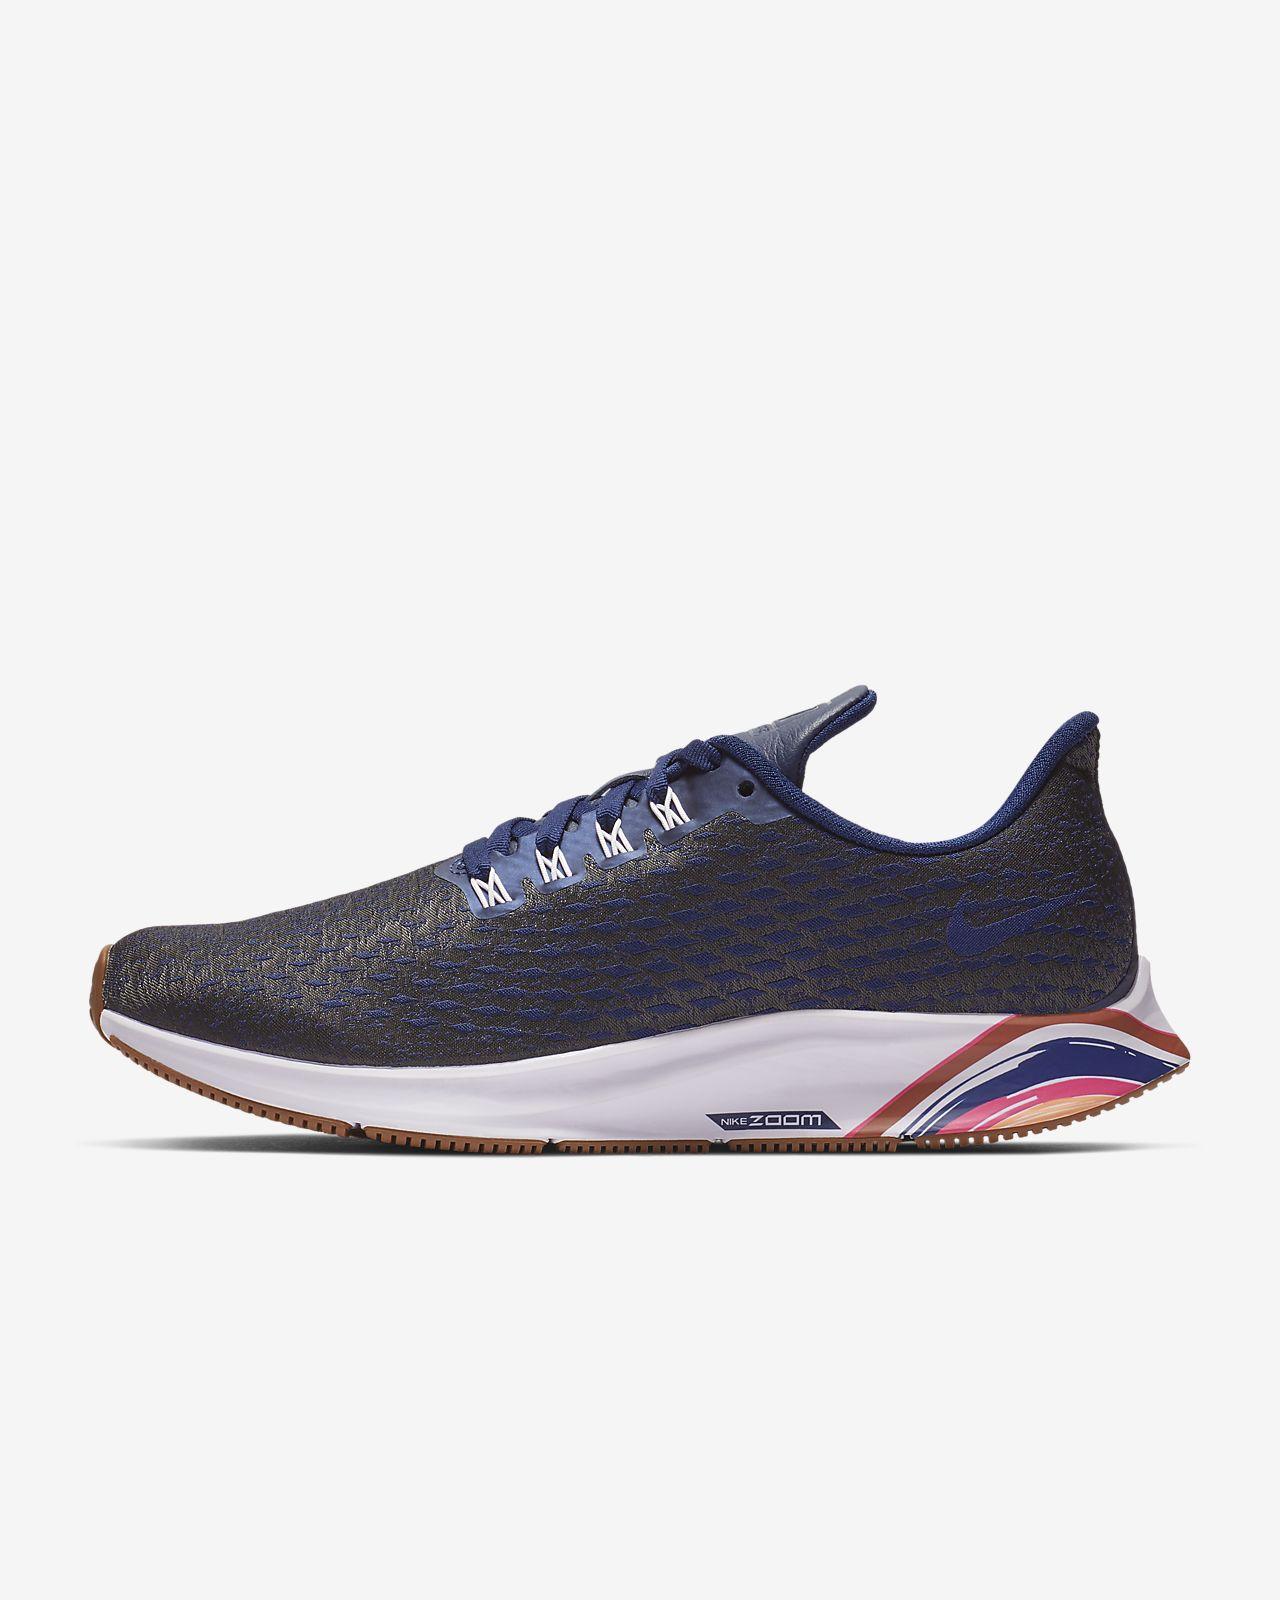 28992a4650d29 Nike Air Zoom Pegasus 35 Premium Women s Running Shoe. Nike.com PT